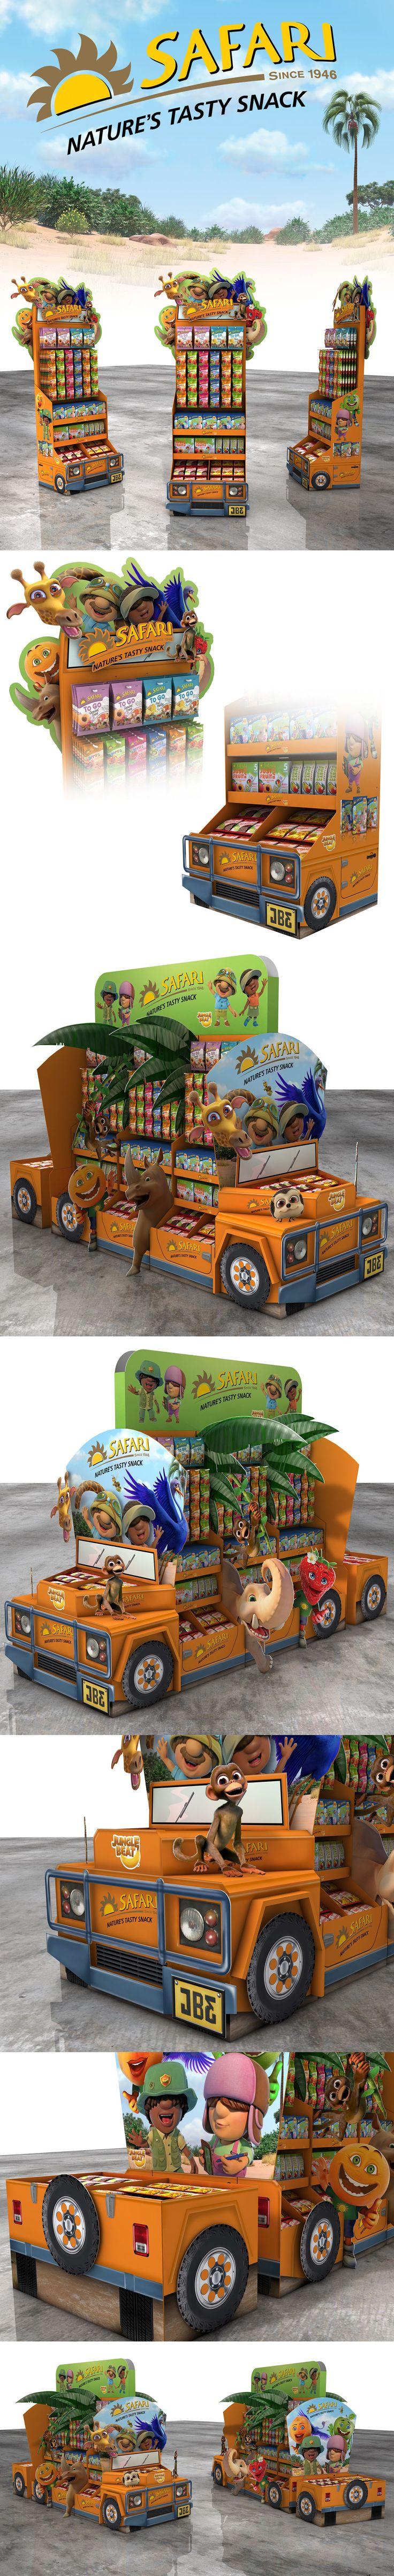 Safari Jeep Display on Behance